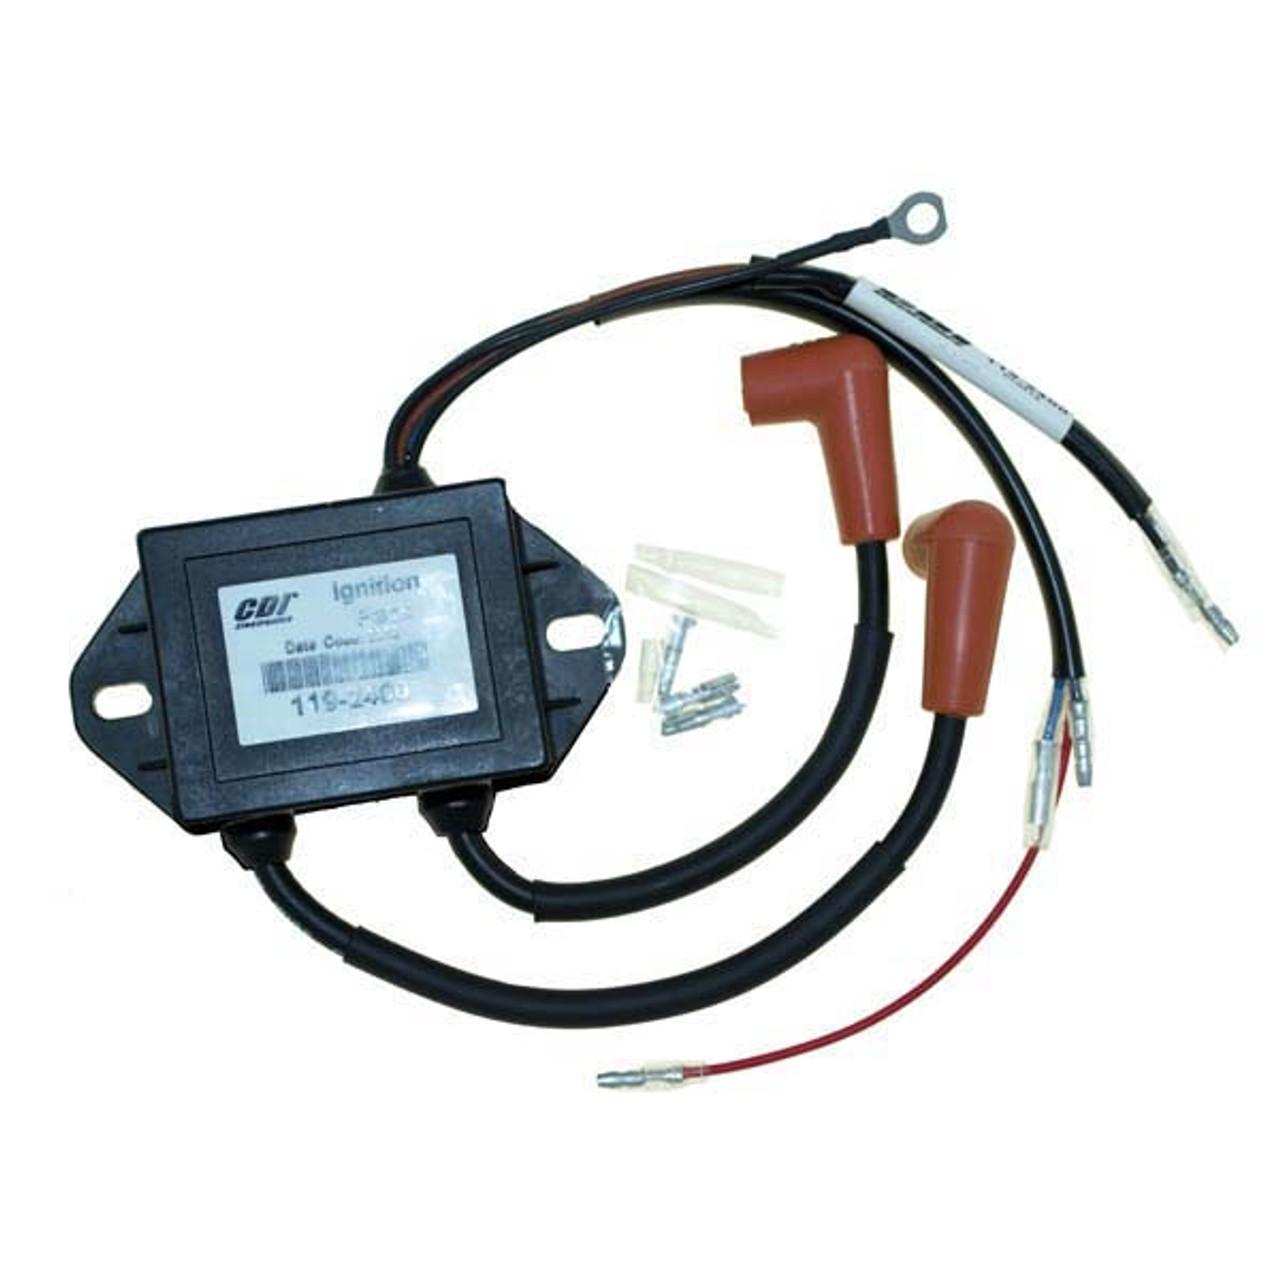 CDI 119-2400 Tohatsu Nissan Ignition Module - 2 Cyl